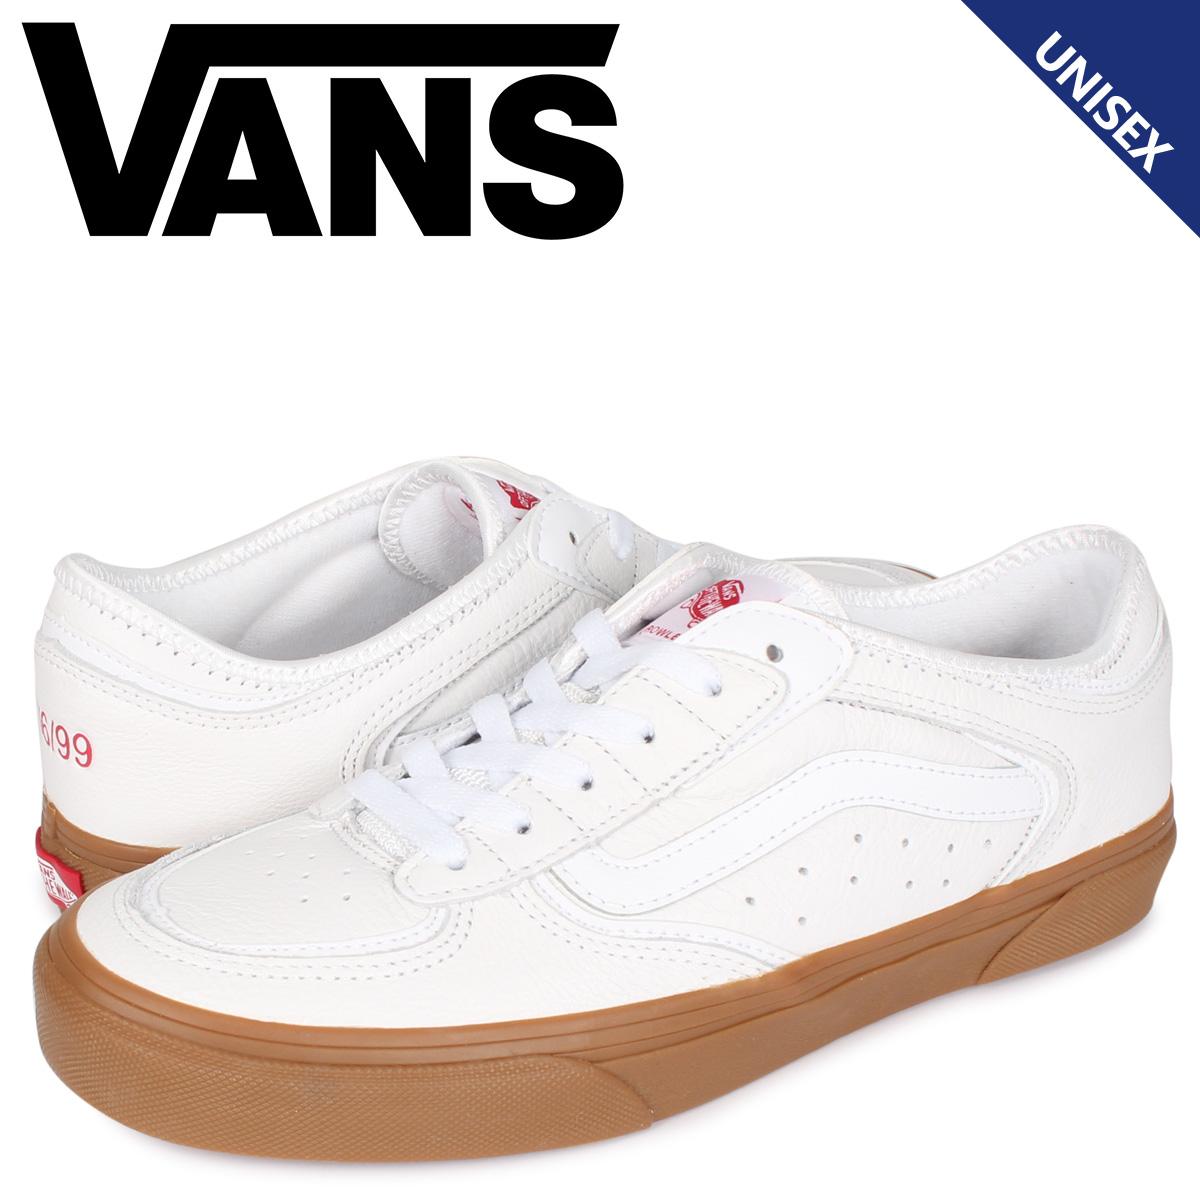 VANS ヴァンズ ロウリークラシック スニーカー メンズ レディース ROWLEY CLASSIC ホワイト 白 VN0A4BTTTRK